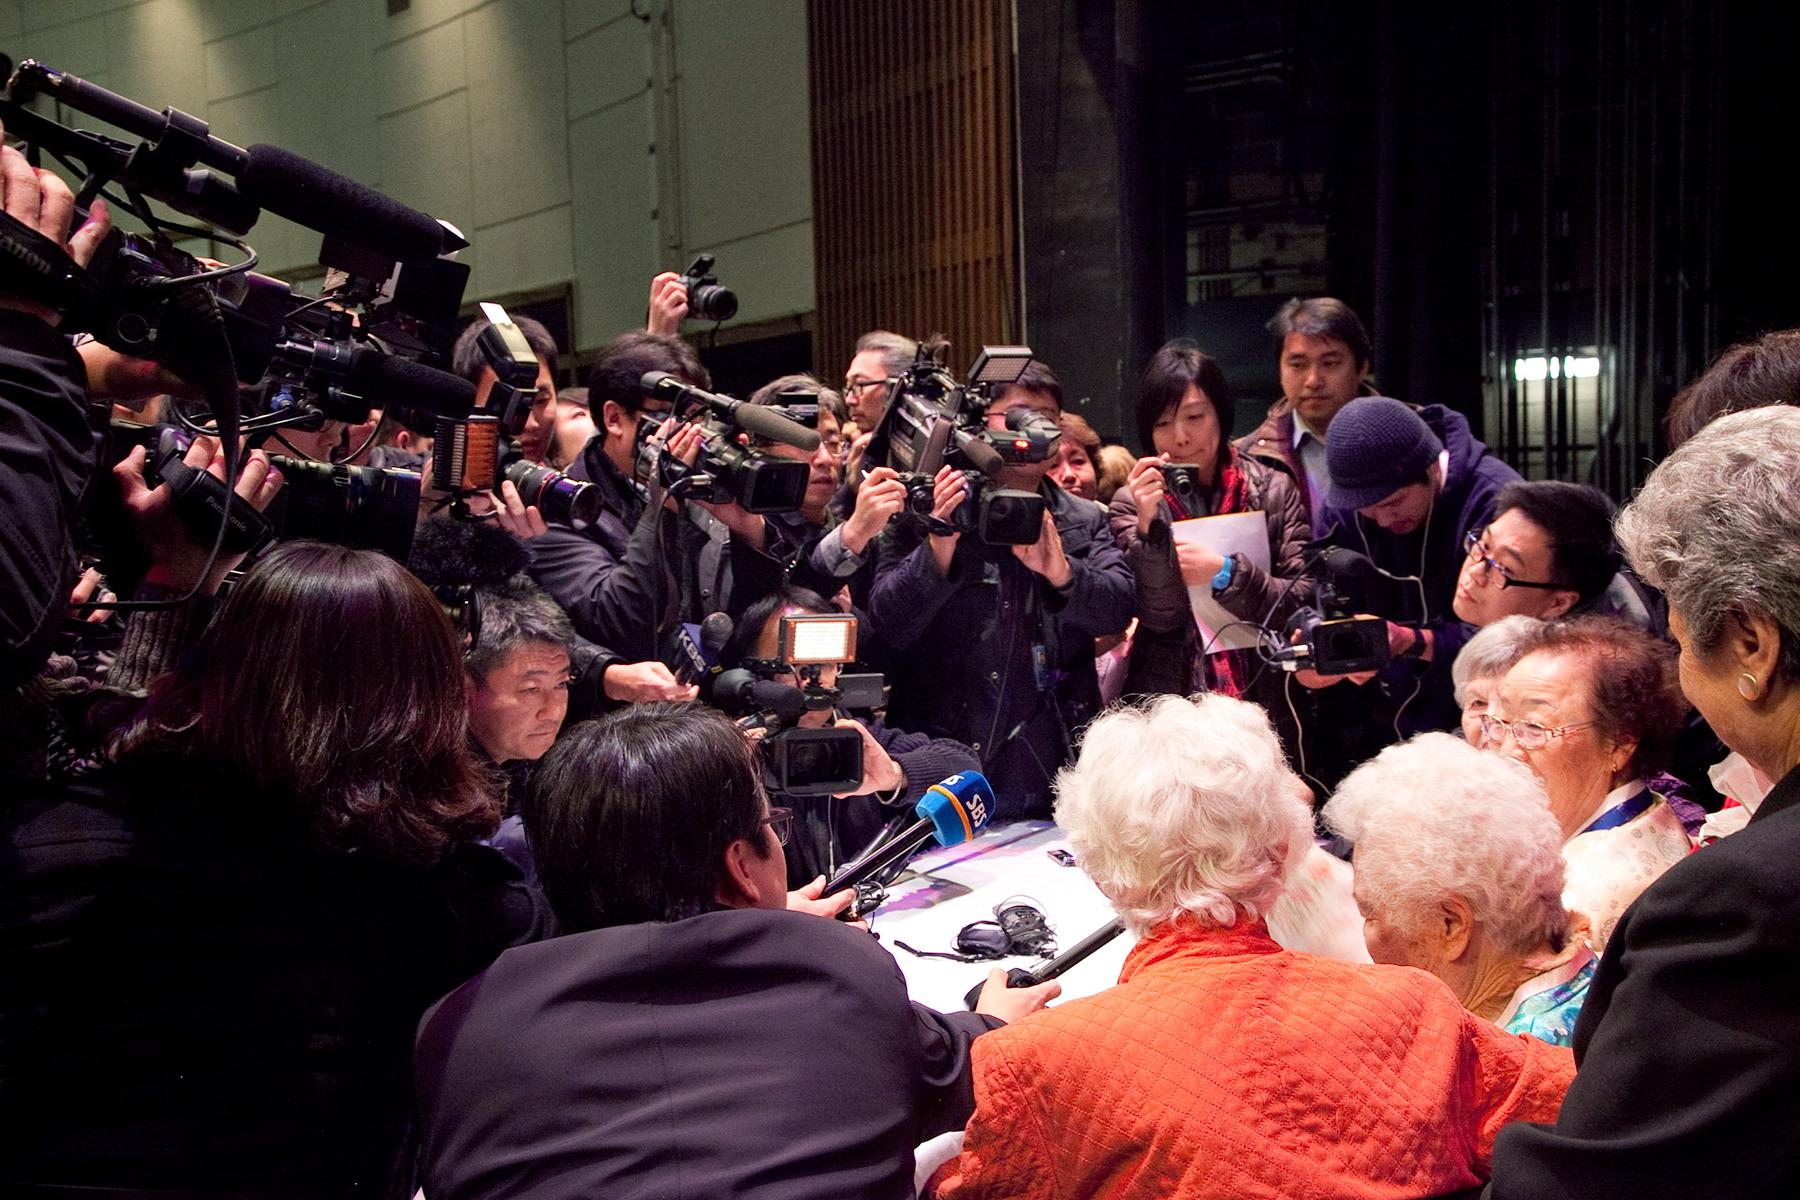 Lee Ok Seon Halmoni and Lee Yong Soo Halmoni giving their testimonies alongside Holocaust survivors Hanne Liebmann and Ethel Katz, Kupferburg Holocaust Center, Queens, NY, 2011